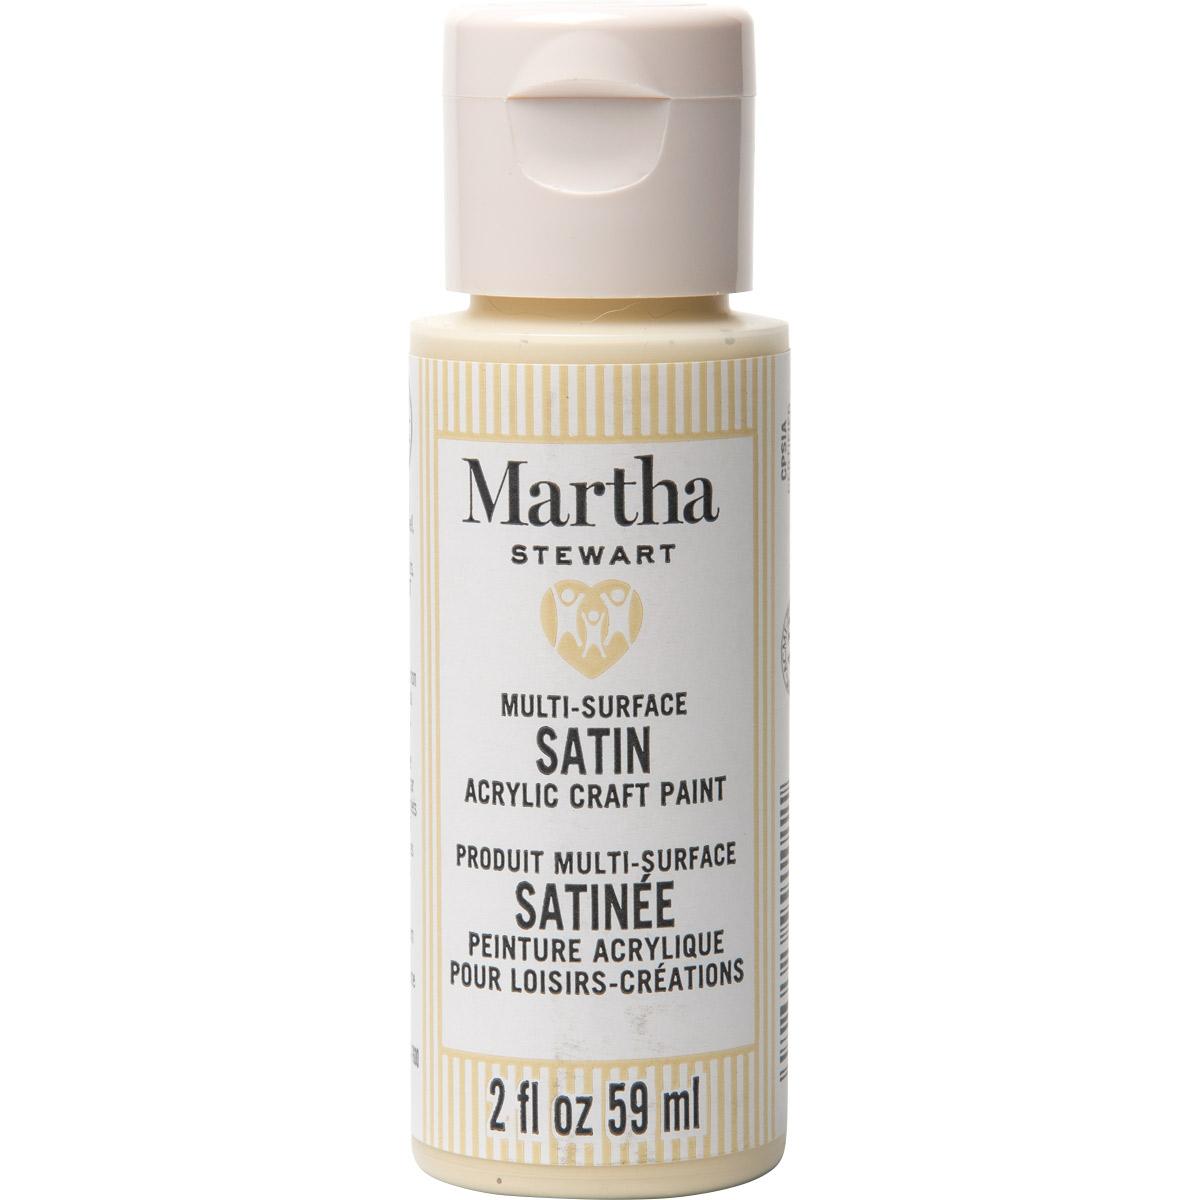 Martha Stewart ® Multi-Surface Satin Acrylic Craft Paint CPSIA - Fawn, 2 oz. - 99101